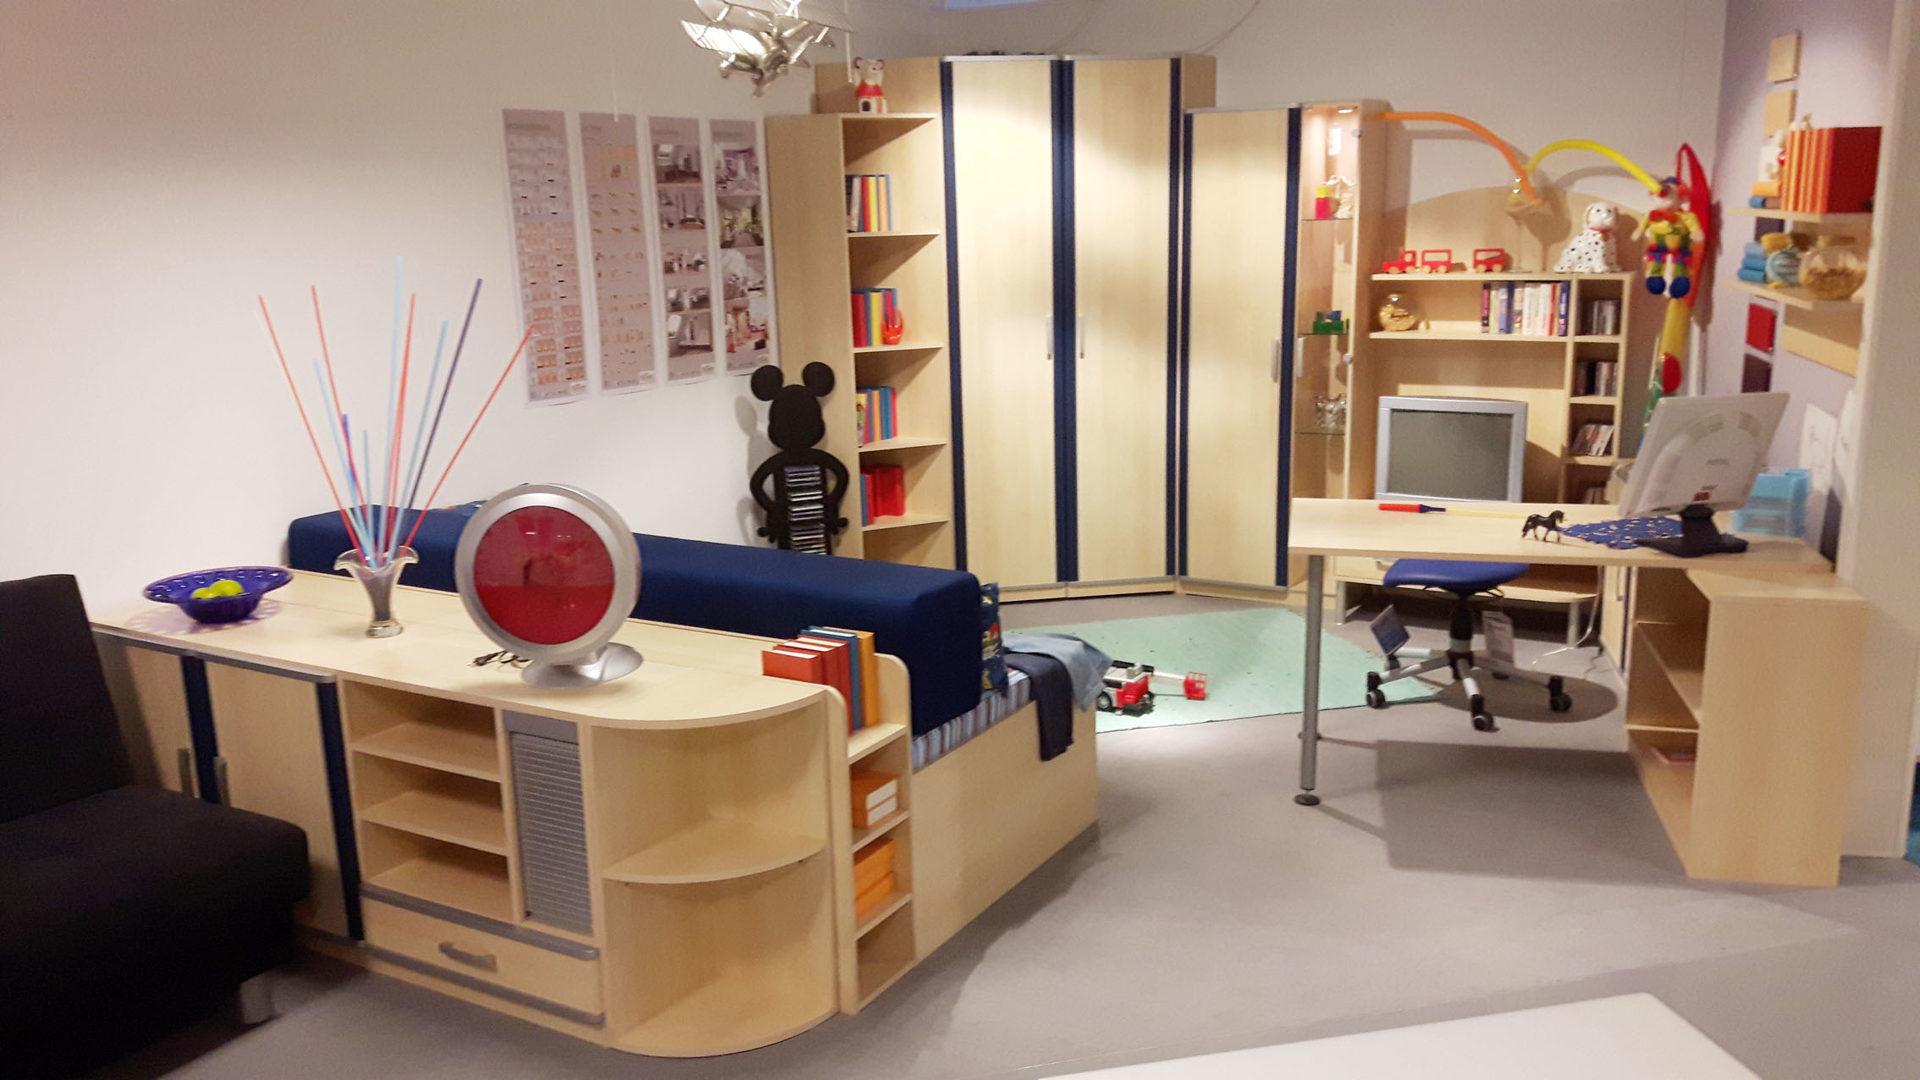 Stylische Jugendzimmer stylische jugendzimmer myhausdesign co